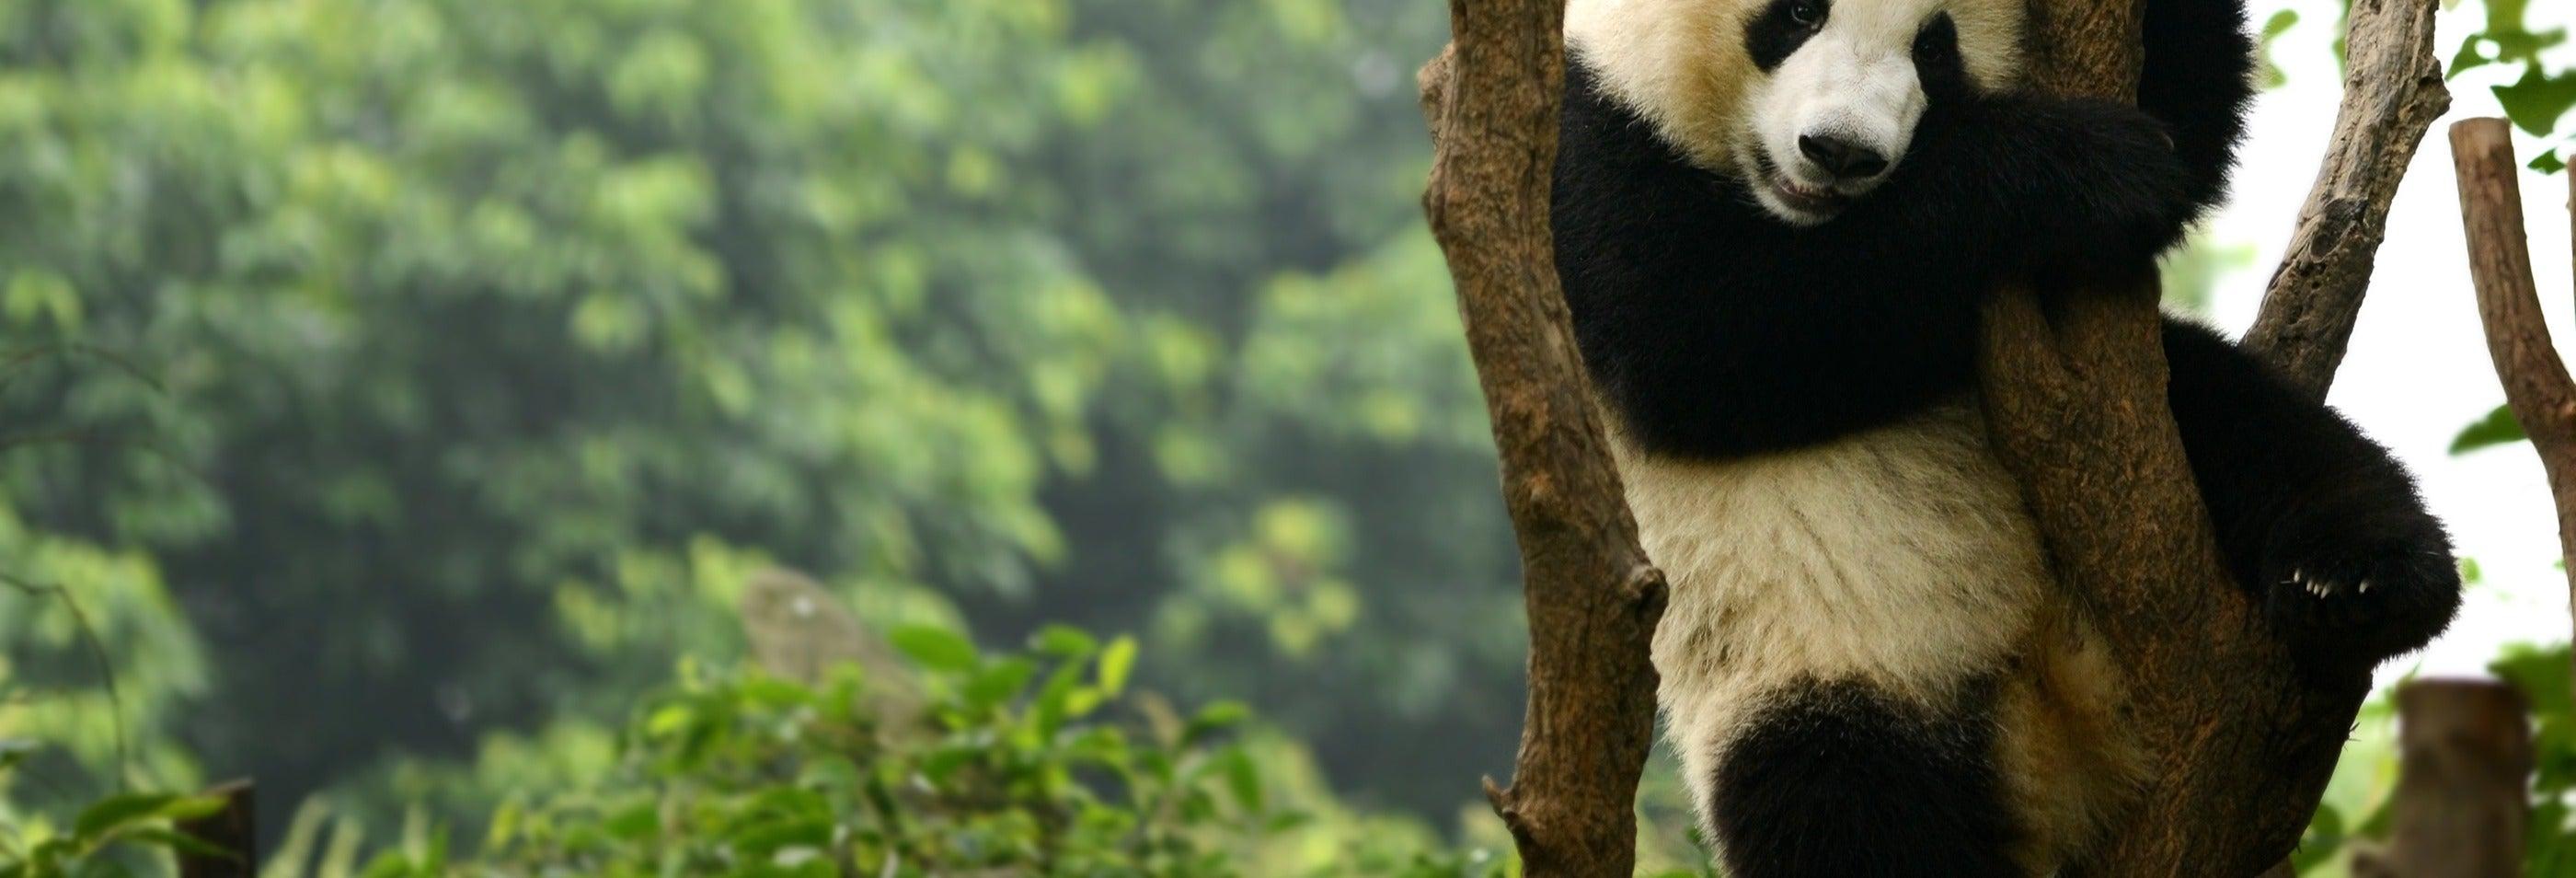 Tour por Chengdú y la Reserva de Pandas